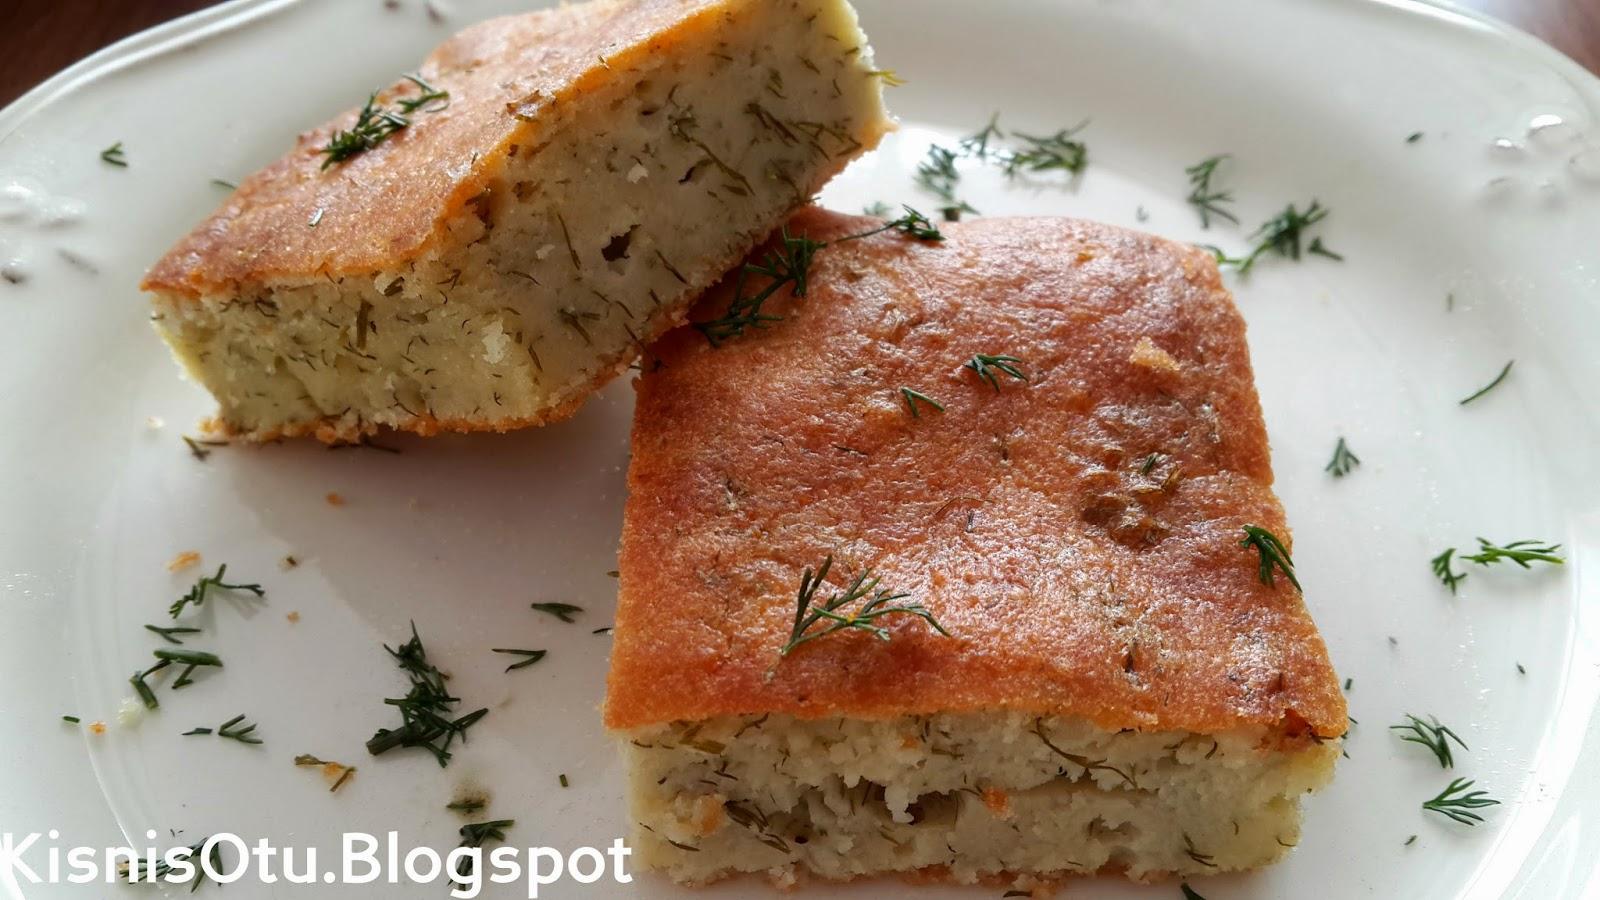 Peynirli kek, kek, kek tarifleri, tarifler, tarifi, denenmiş tarifler, tuzlu kek tarifleri, lezzetli, ikram, misafir